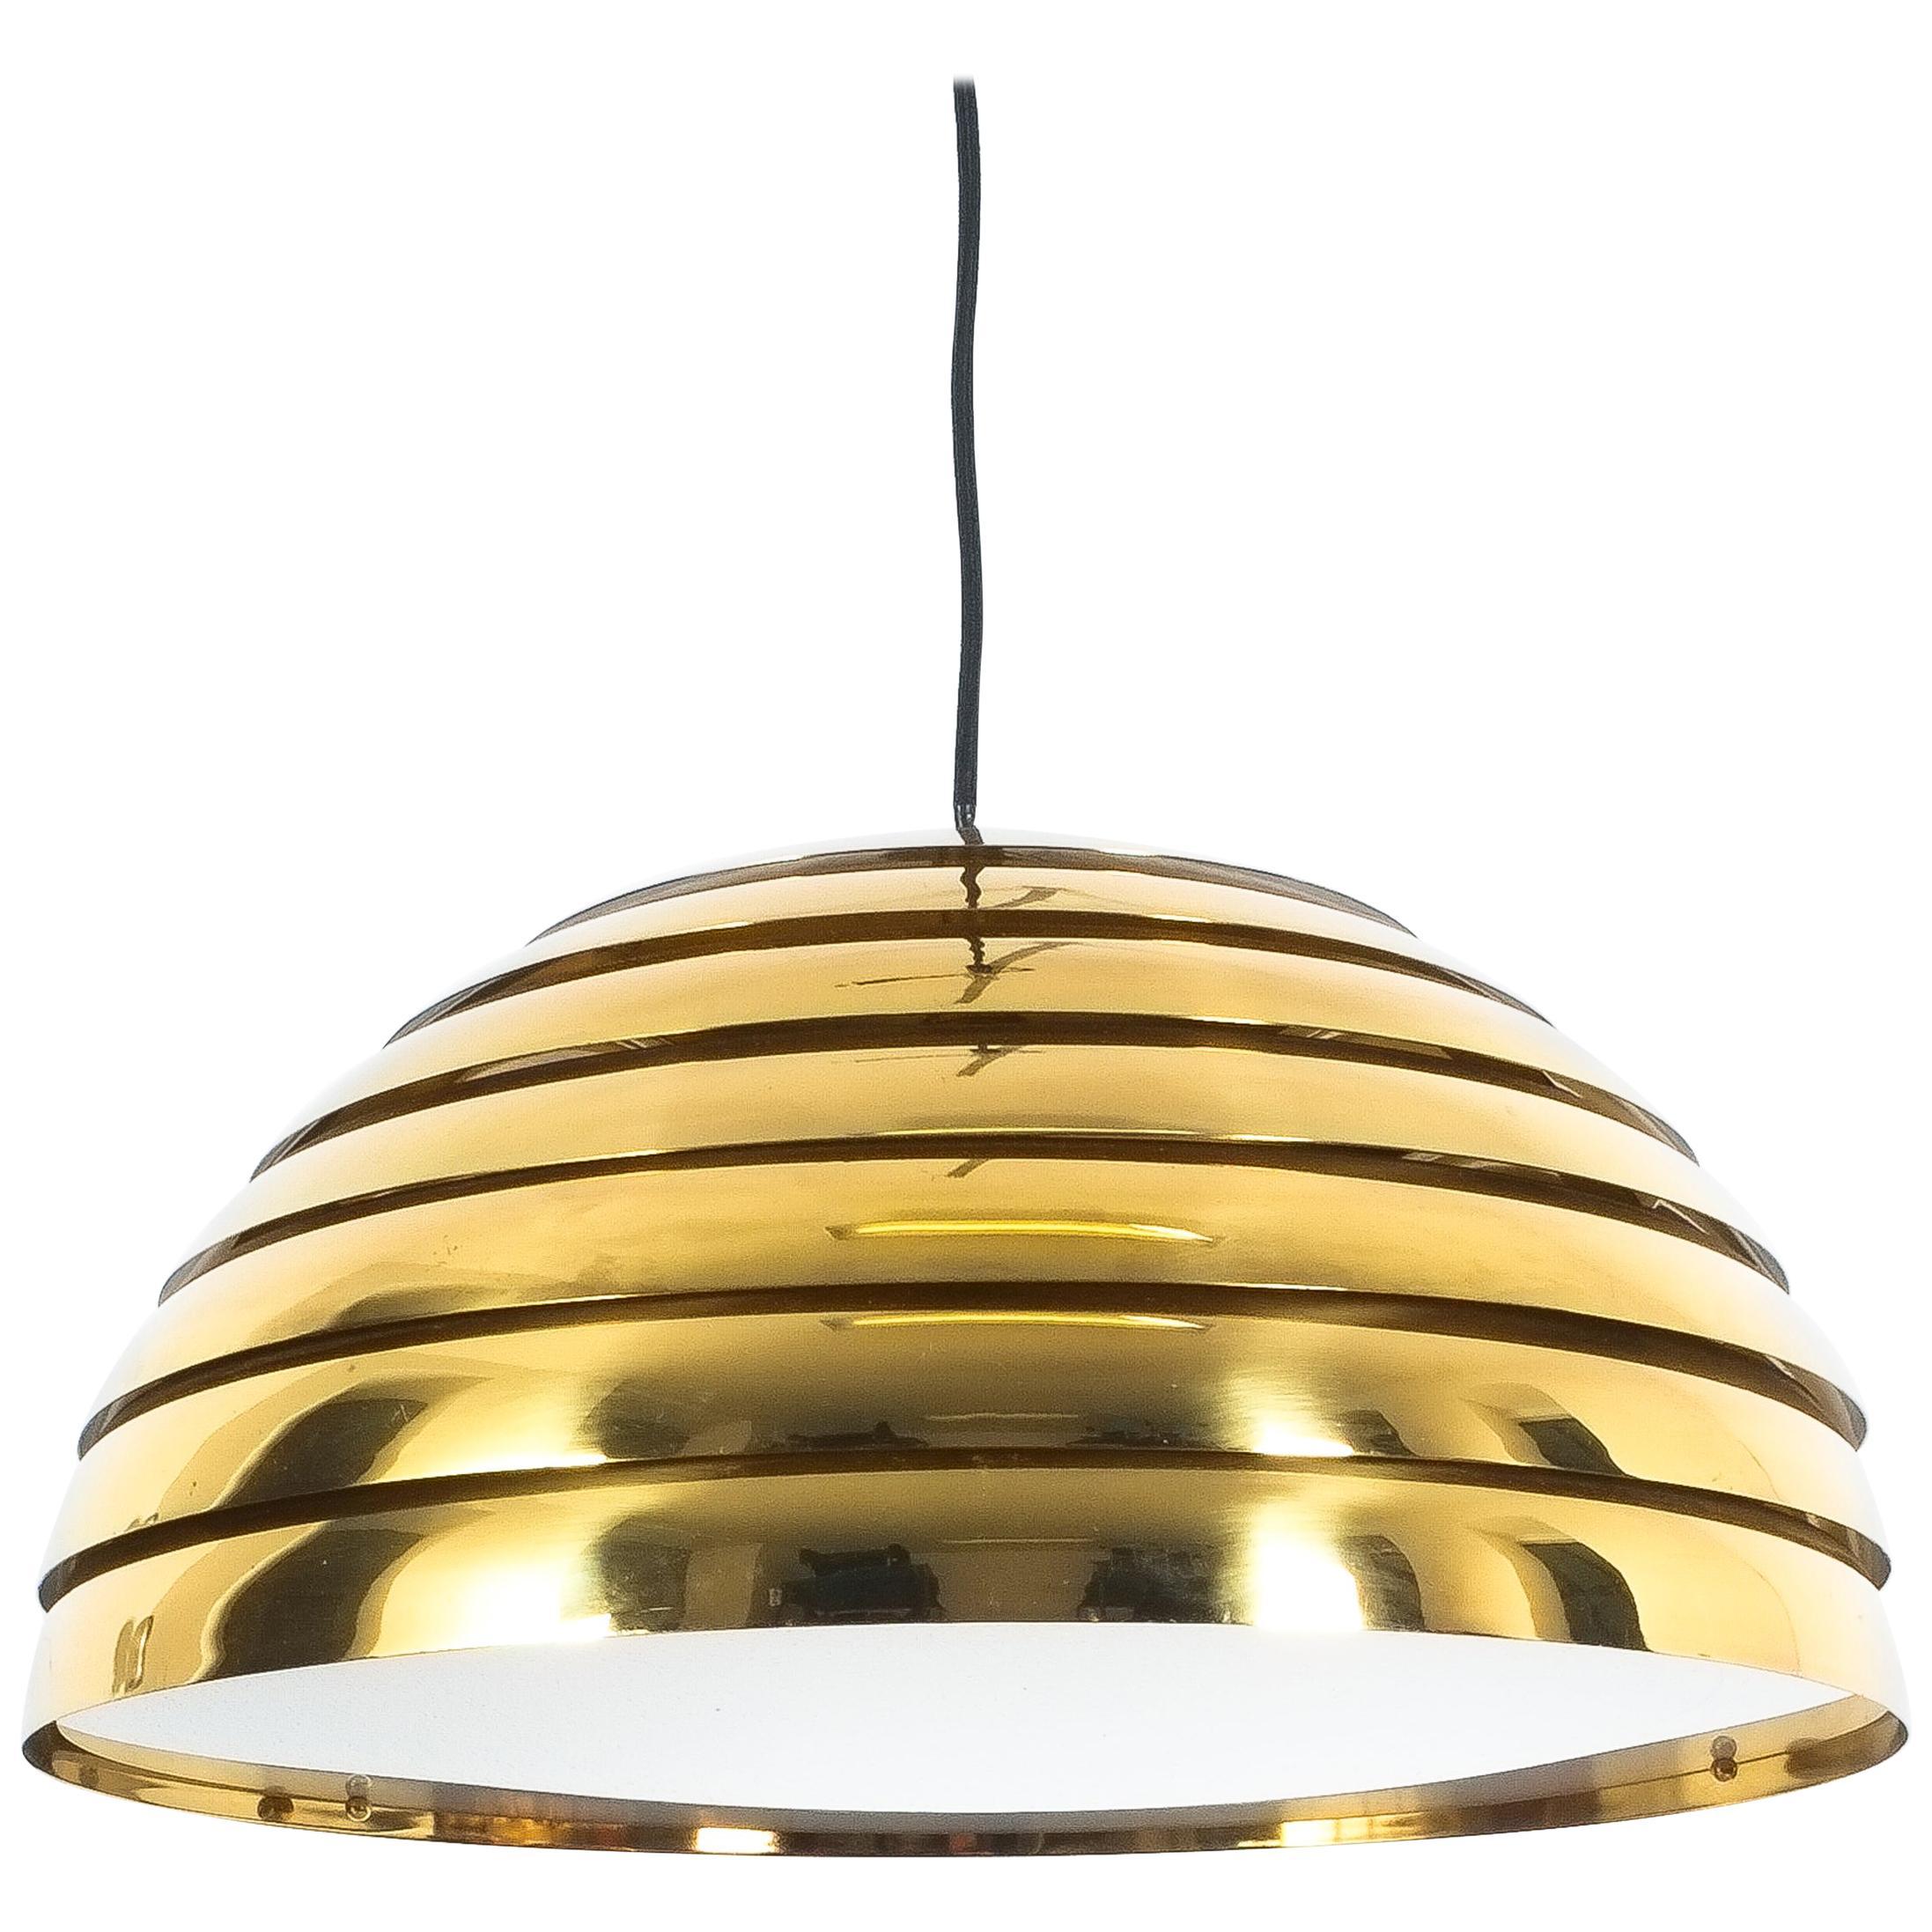 Florian Schulz Large Brass Dome Pendant, Germany